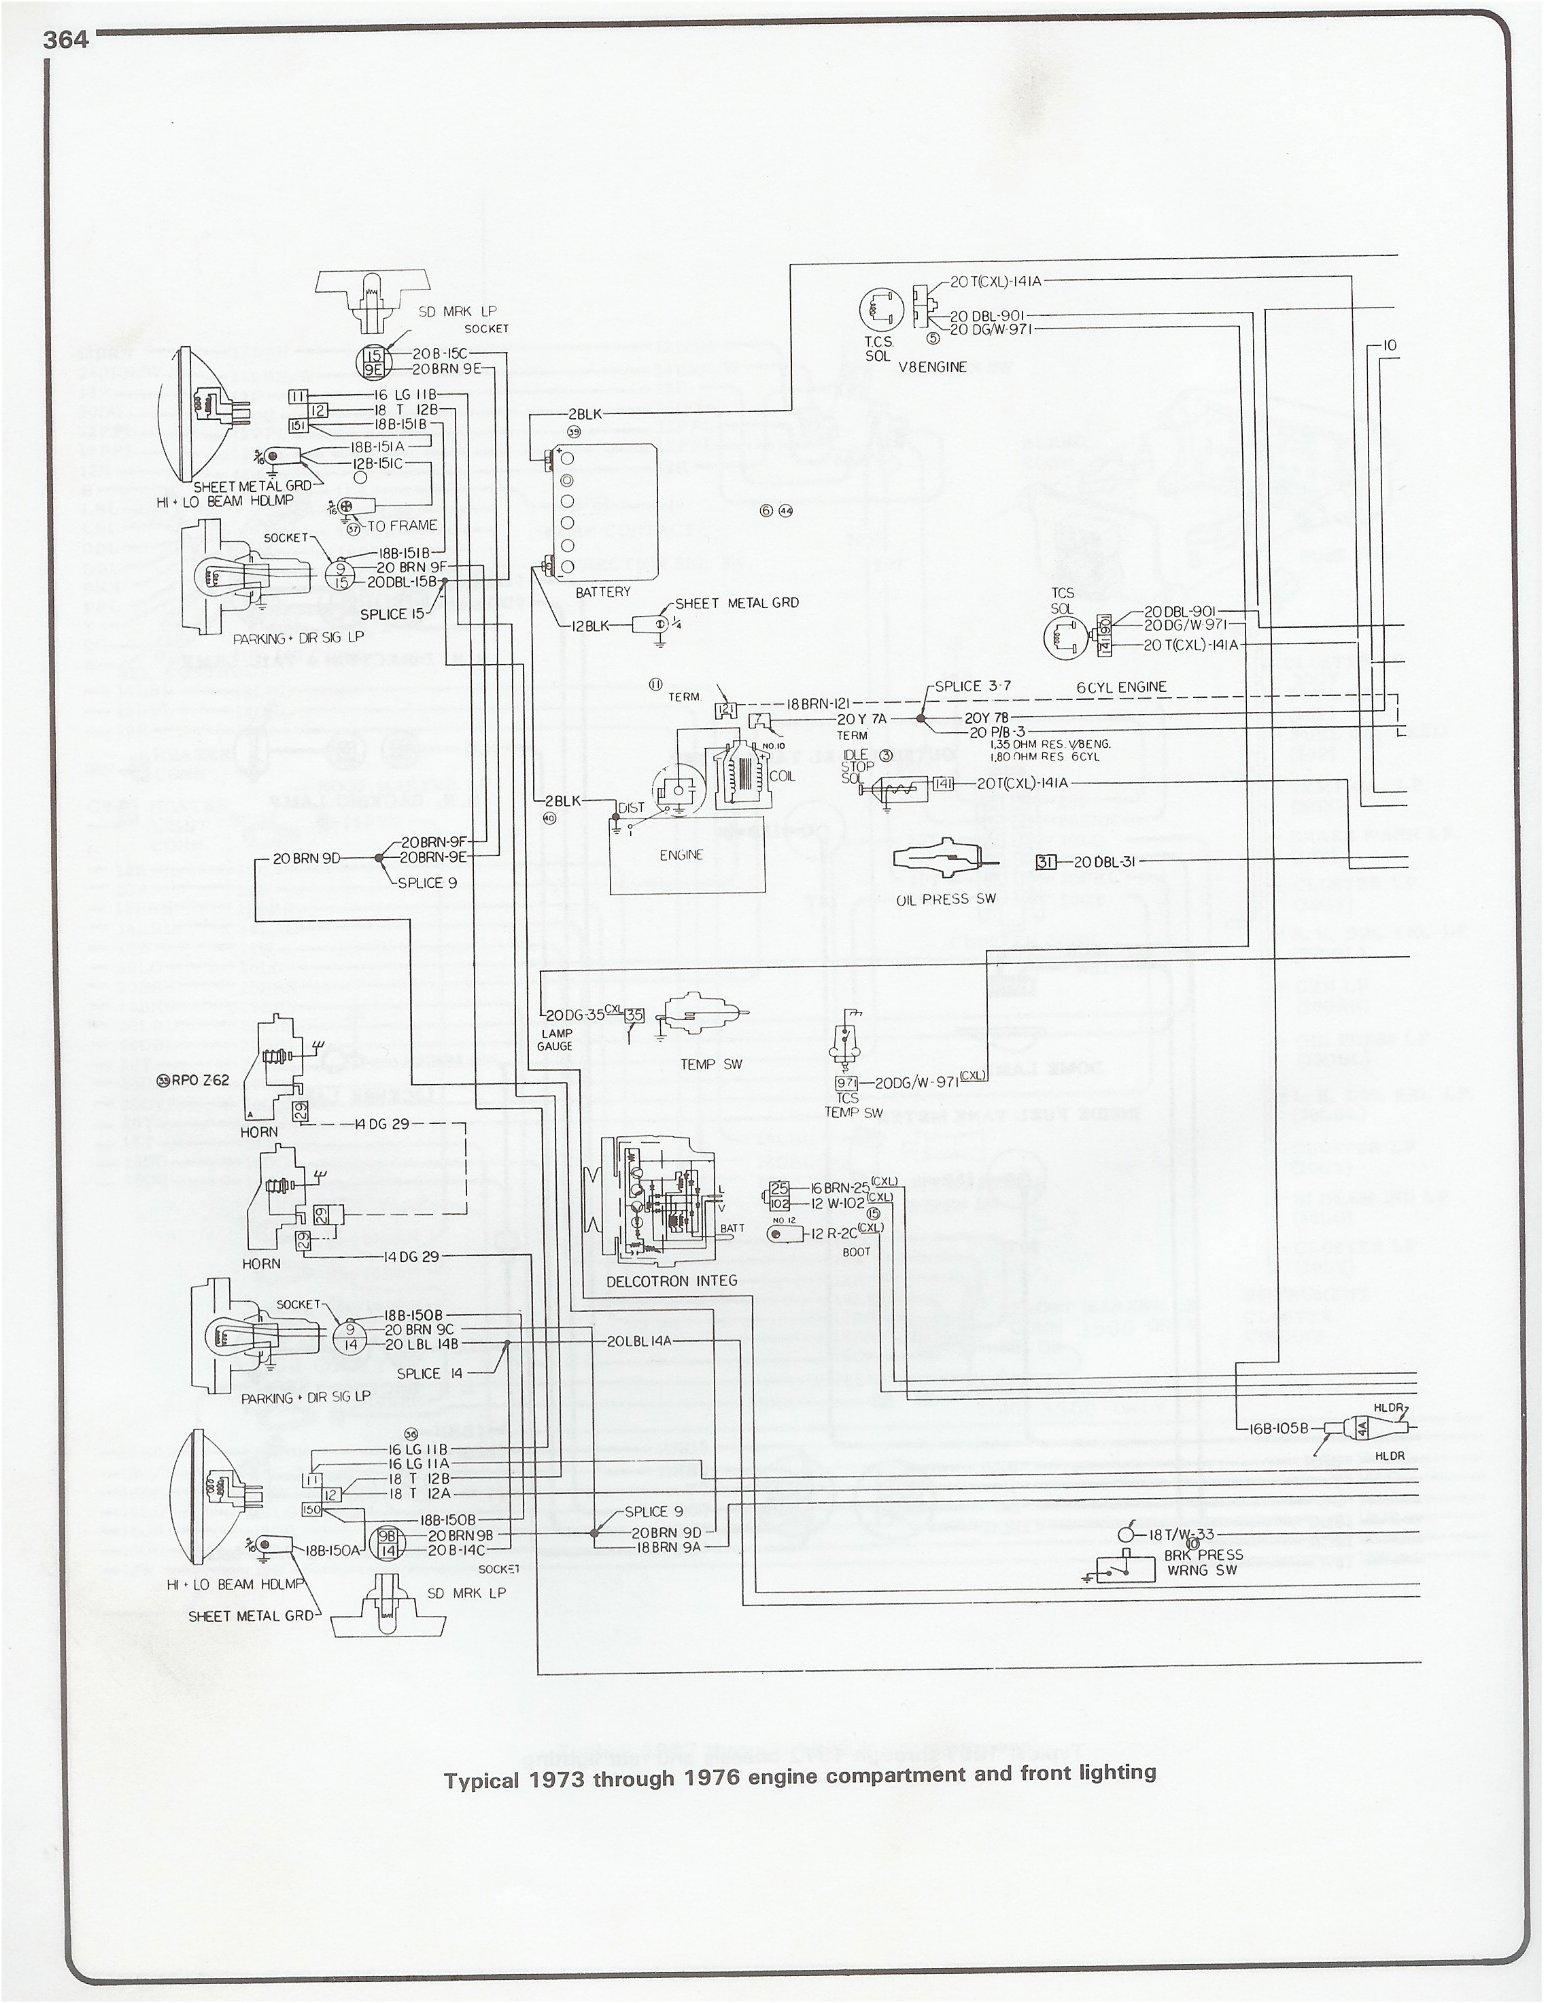 1 8T Fuse Diagram | Wiring Library - 2004 Silverado Bose Amp Wiring Diagram